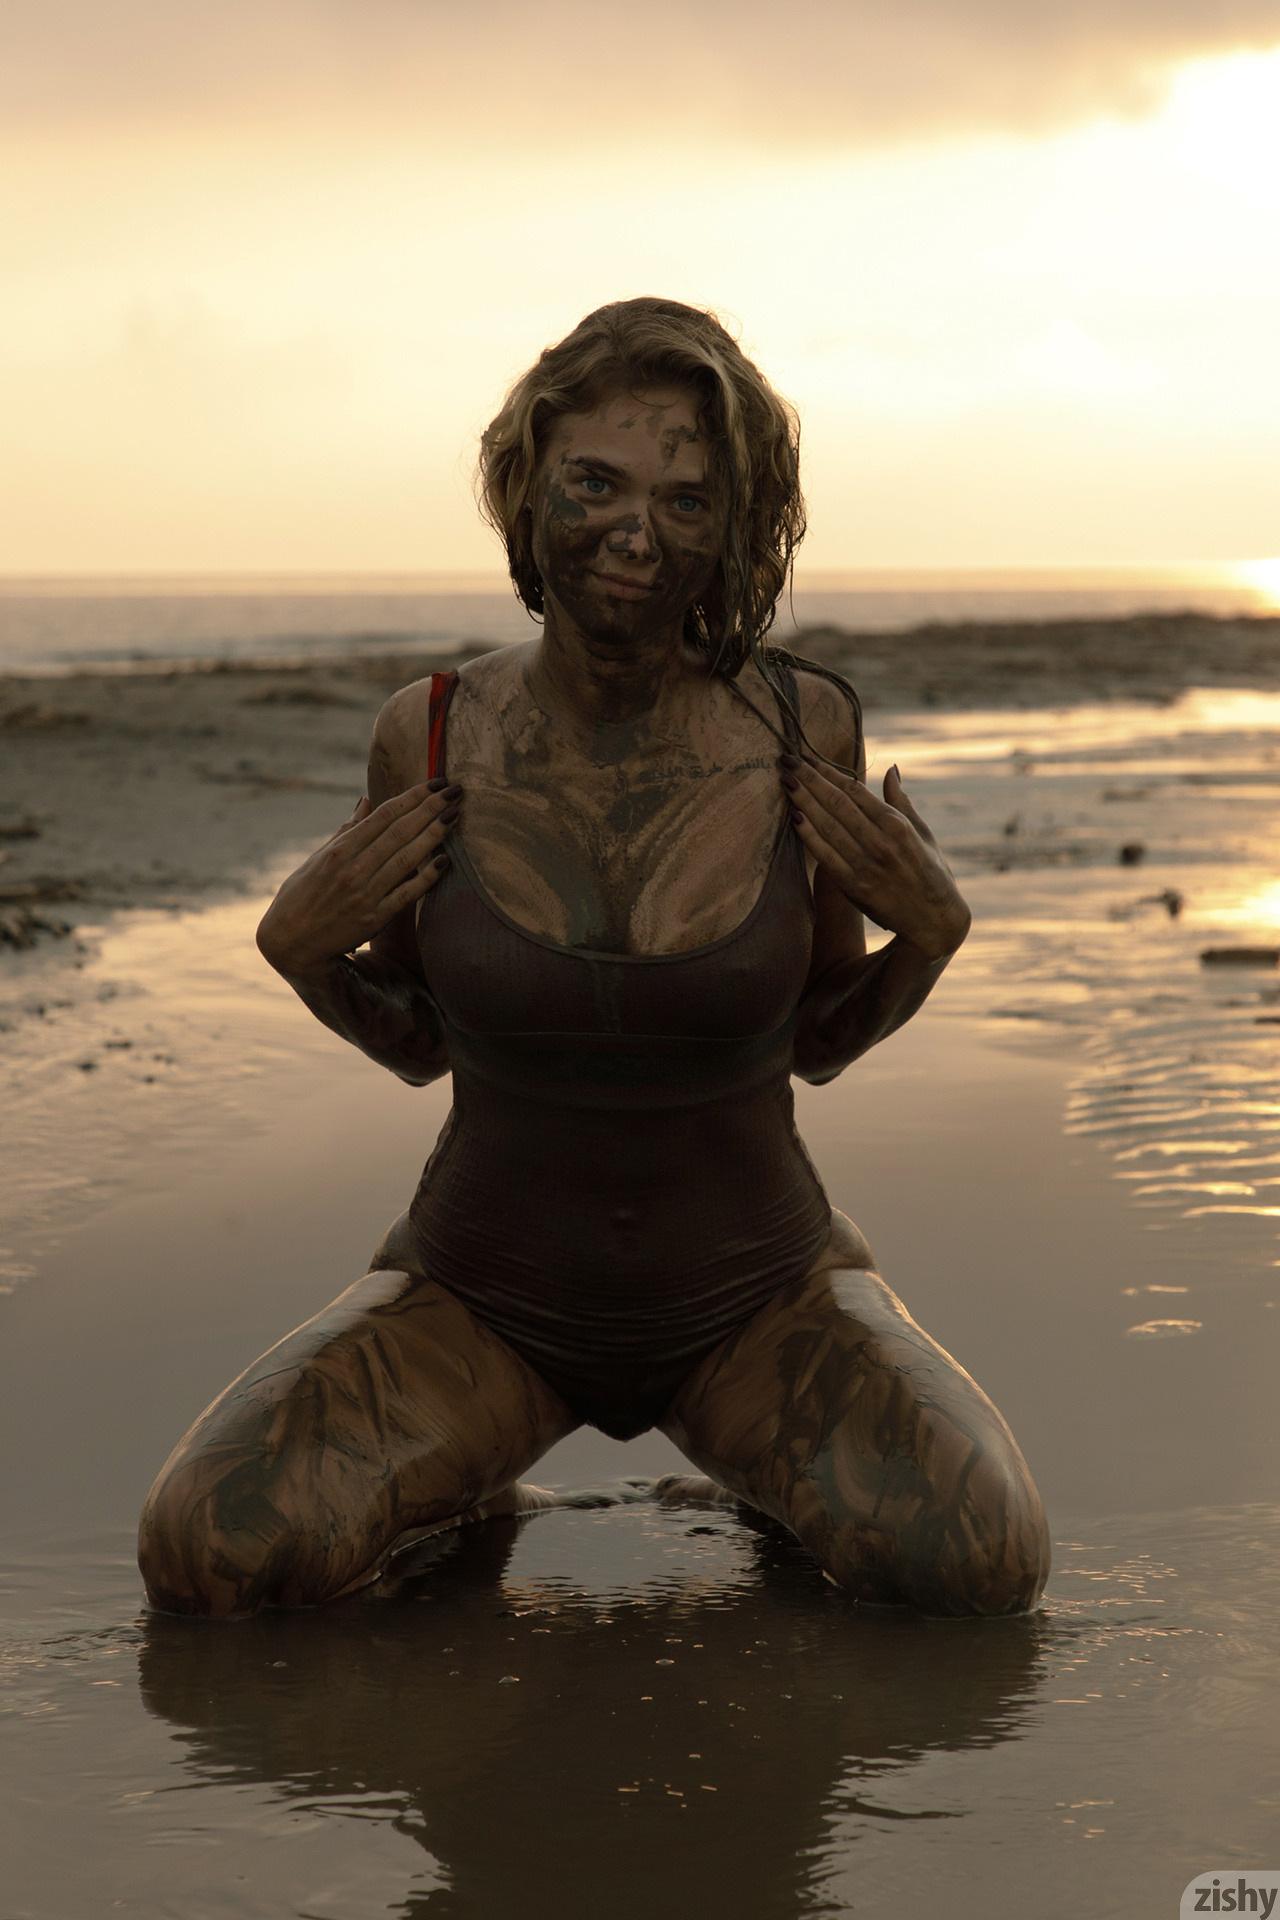 Sofia Orlova On Gryaznyy Beach Zishy (53)